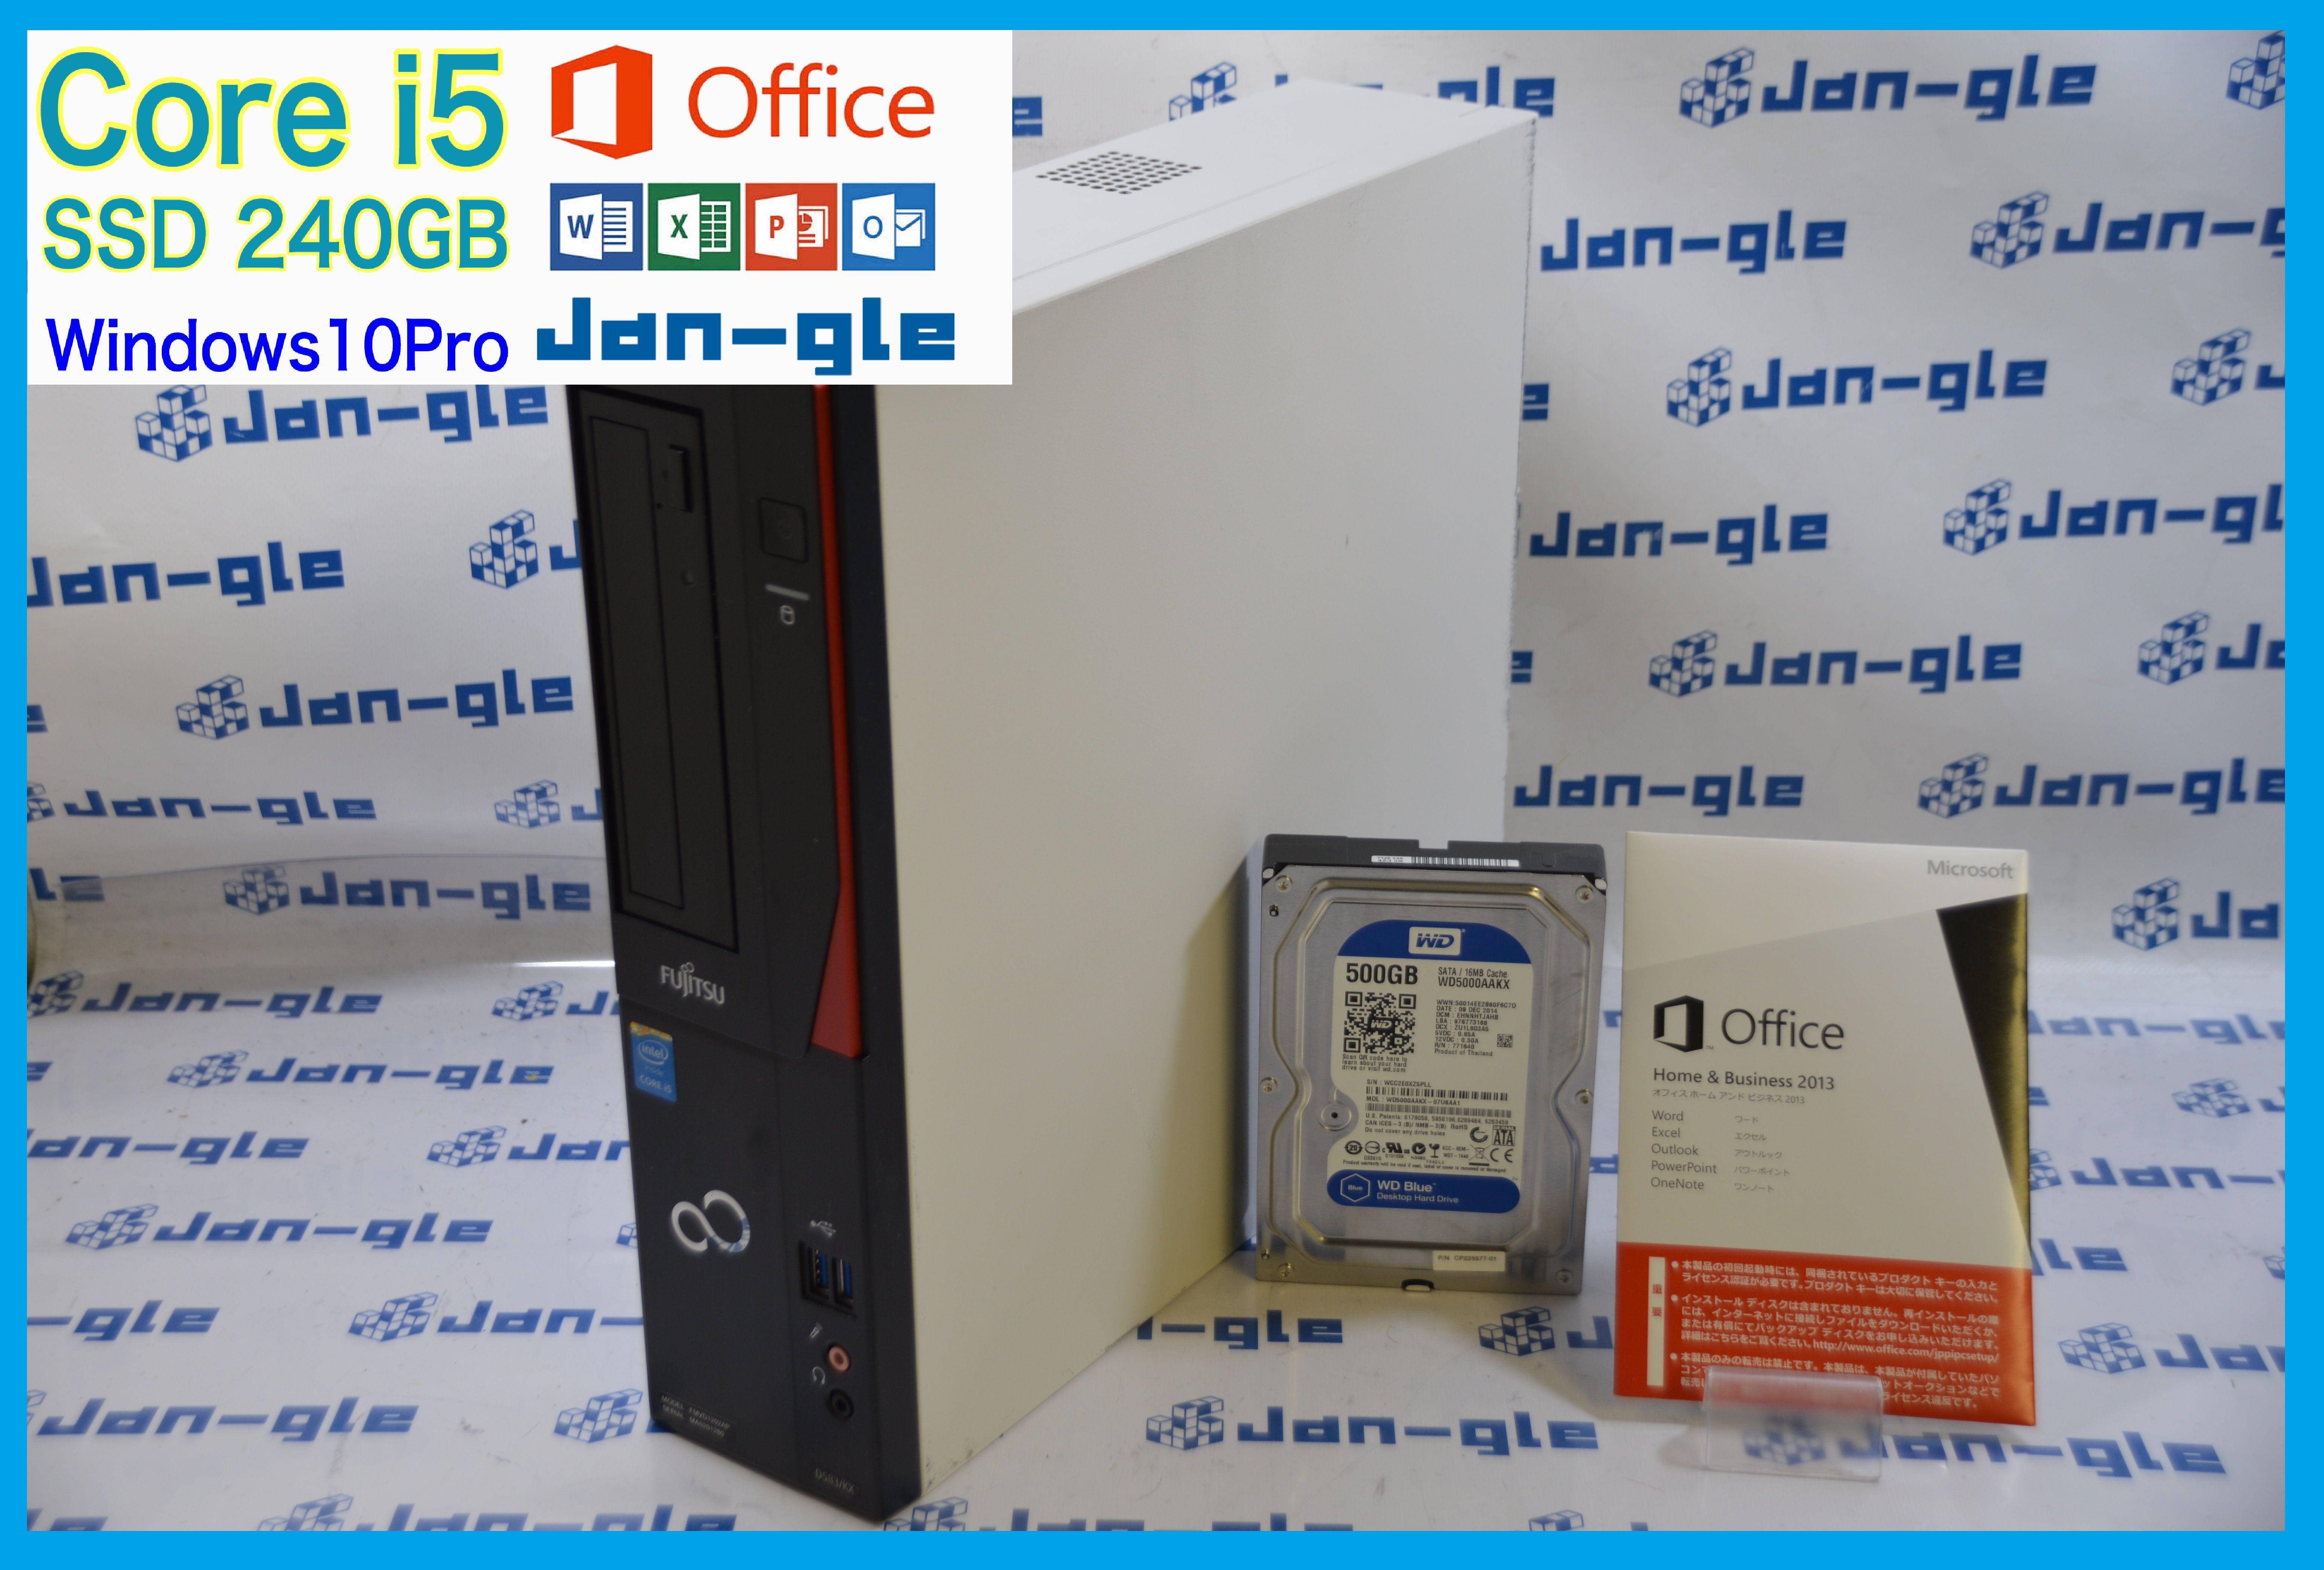 【KS】【中古】【office付 】Win10 Pro i5 SSD換装済!! HDD付属!!高速PC FMVD1202AP D583/kxこの機会に是非!!R021798G☆